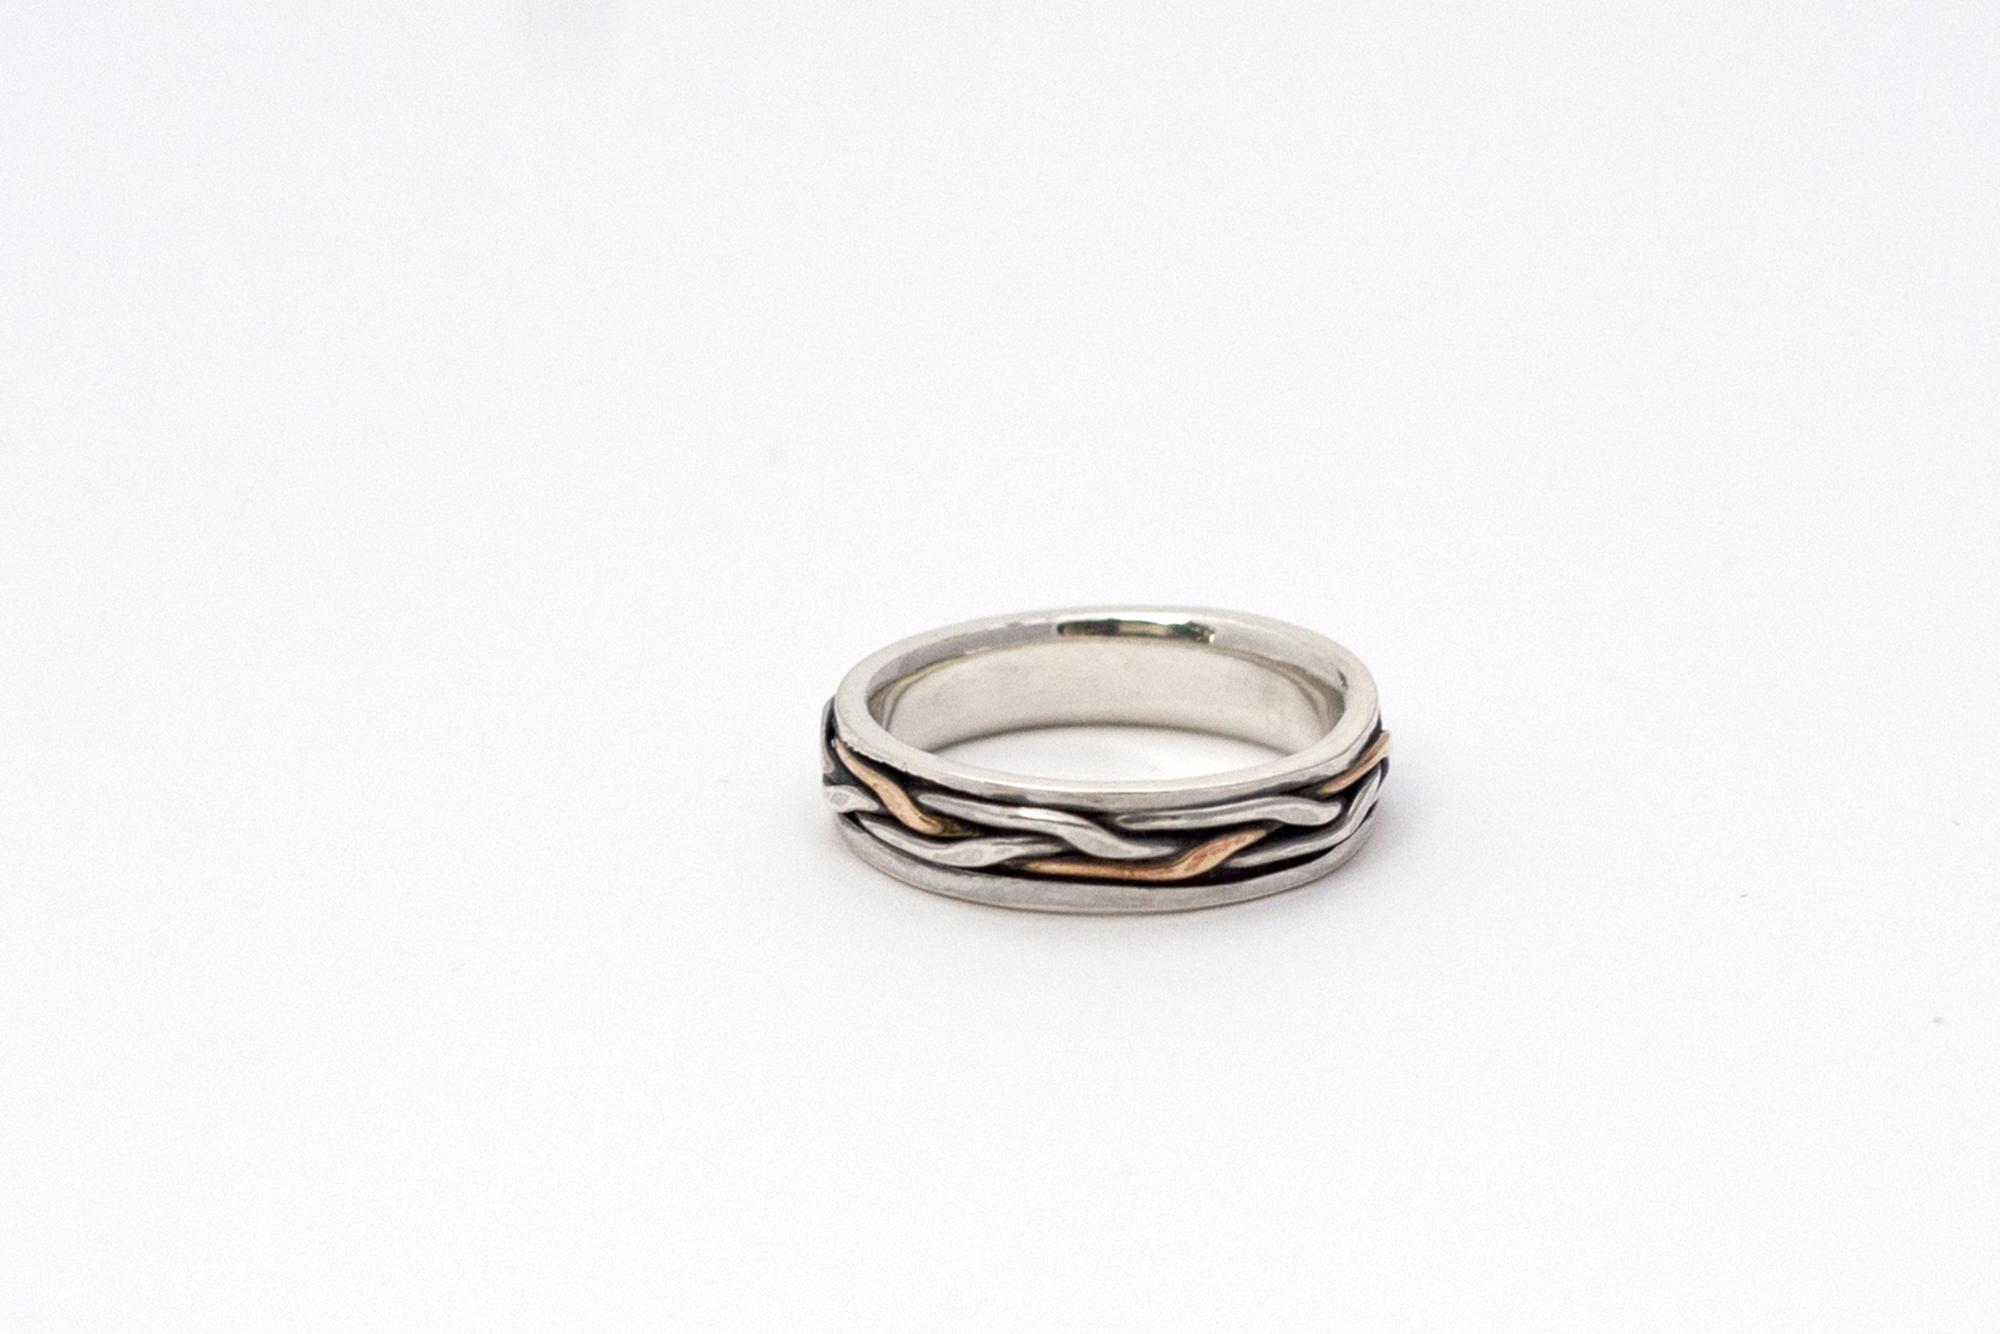 Bryan's Wedding Ring